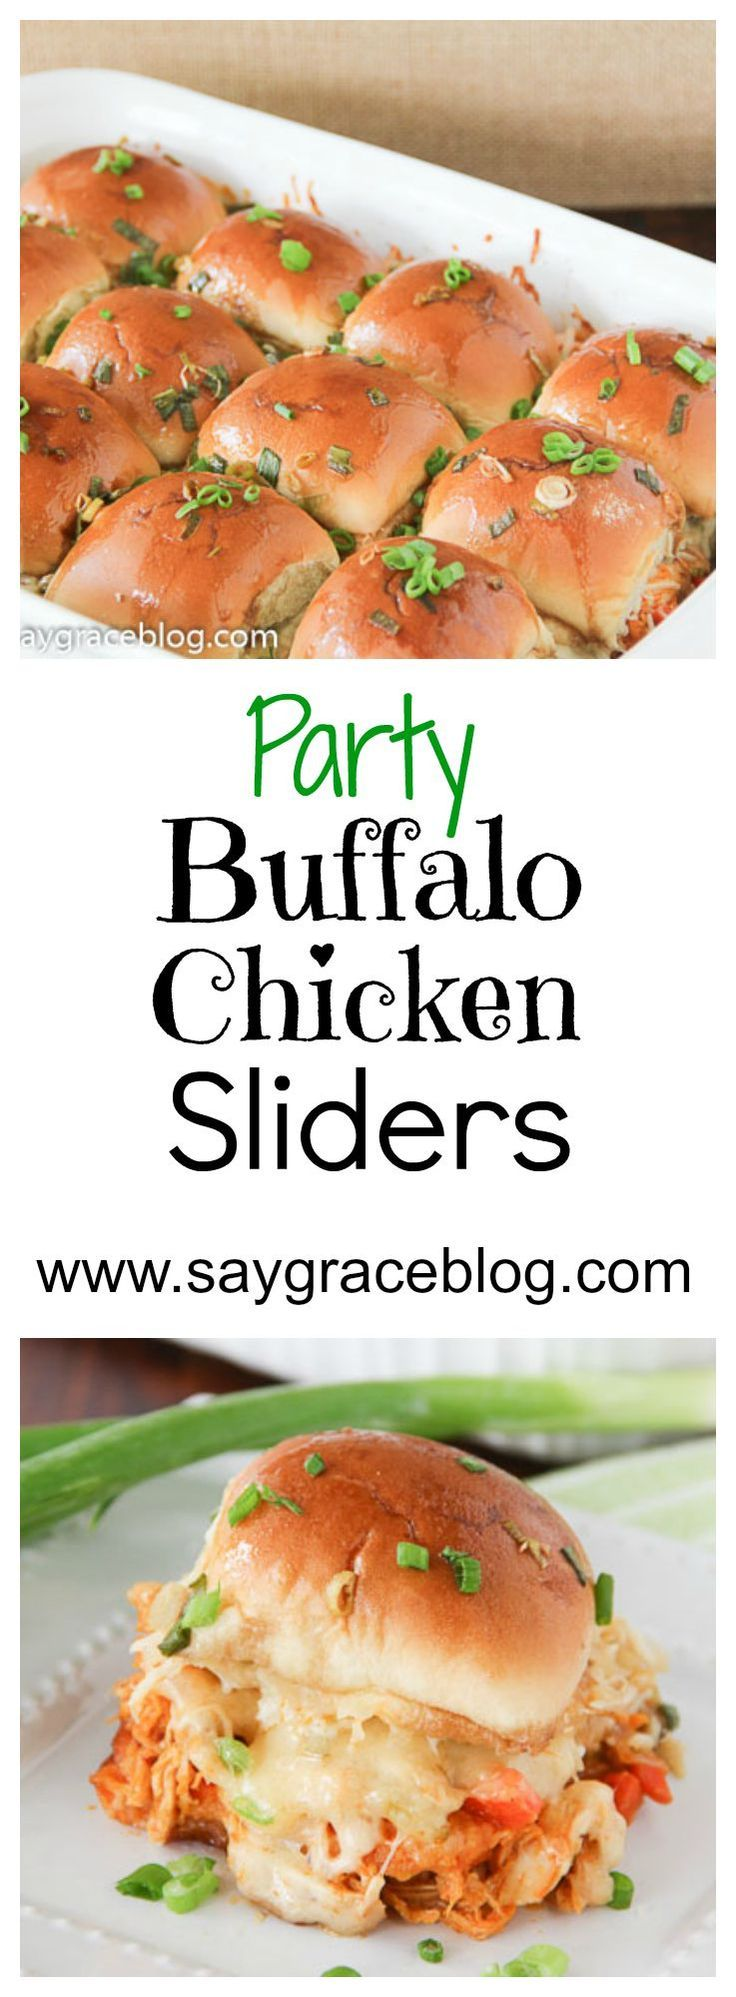 Party Buffalo Chicken Sliders